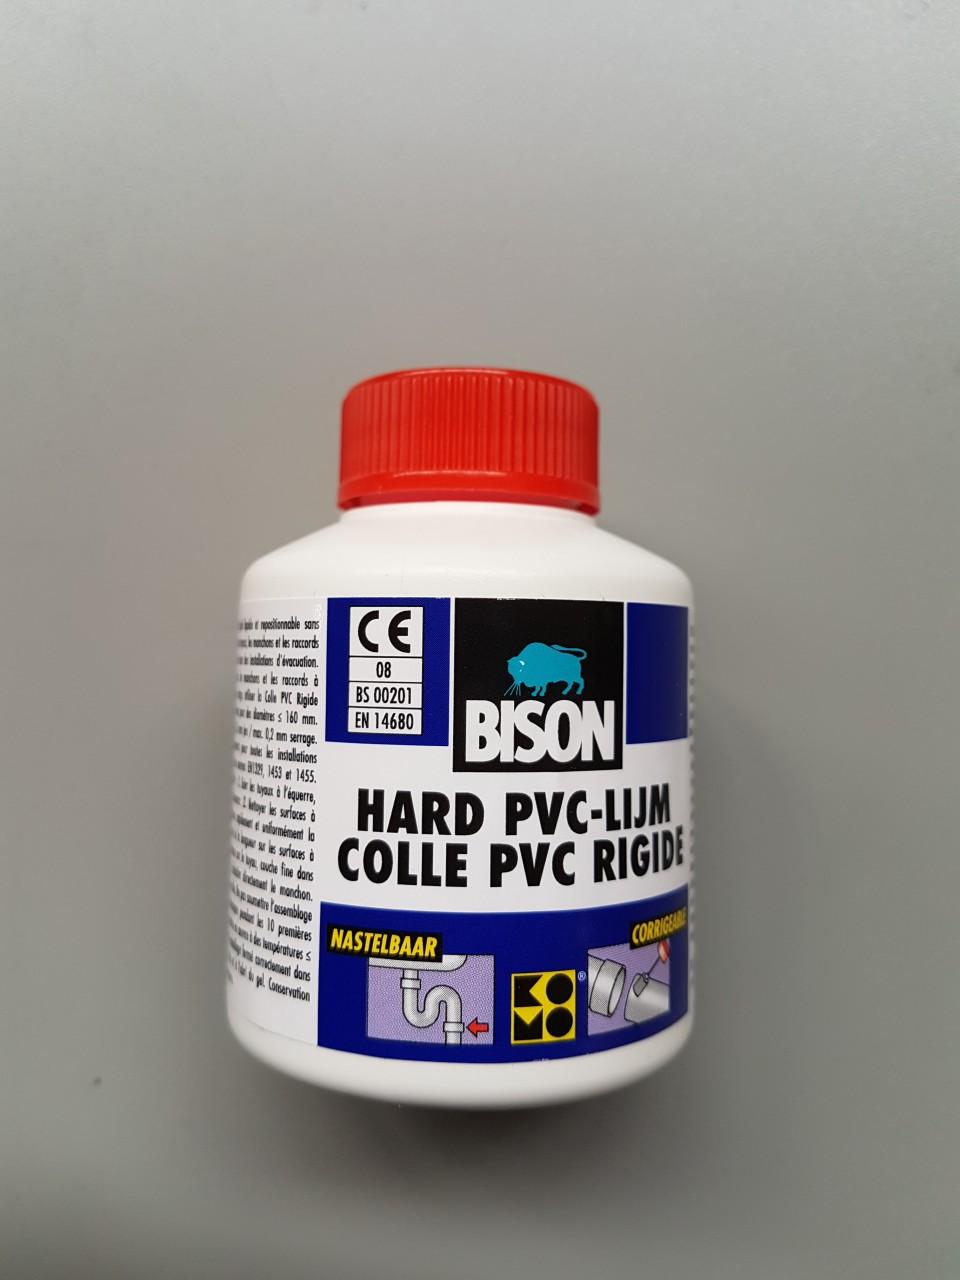 hard pvc-lijm